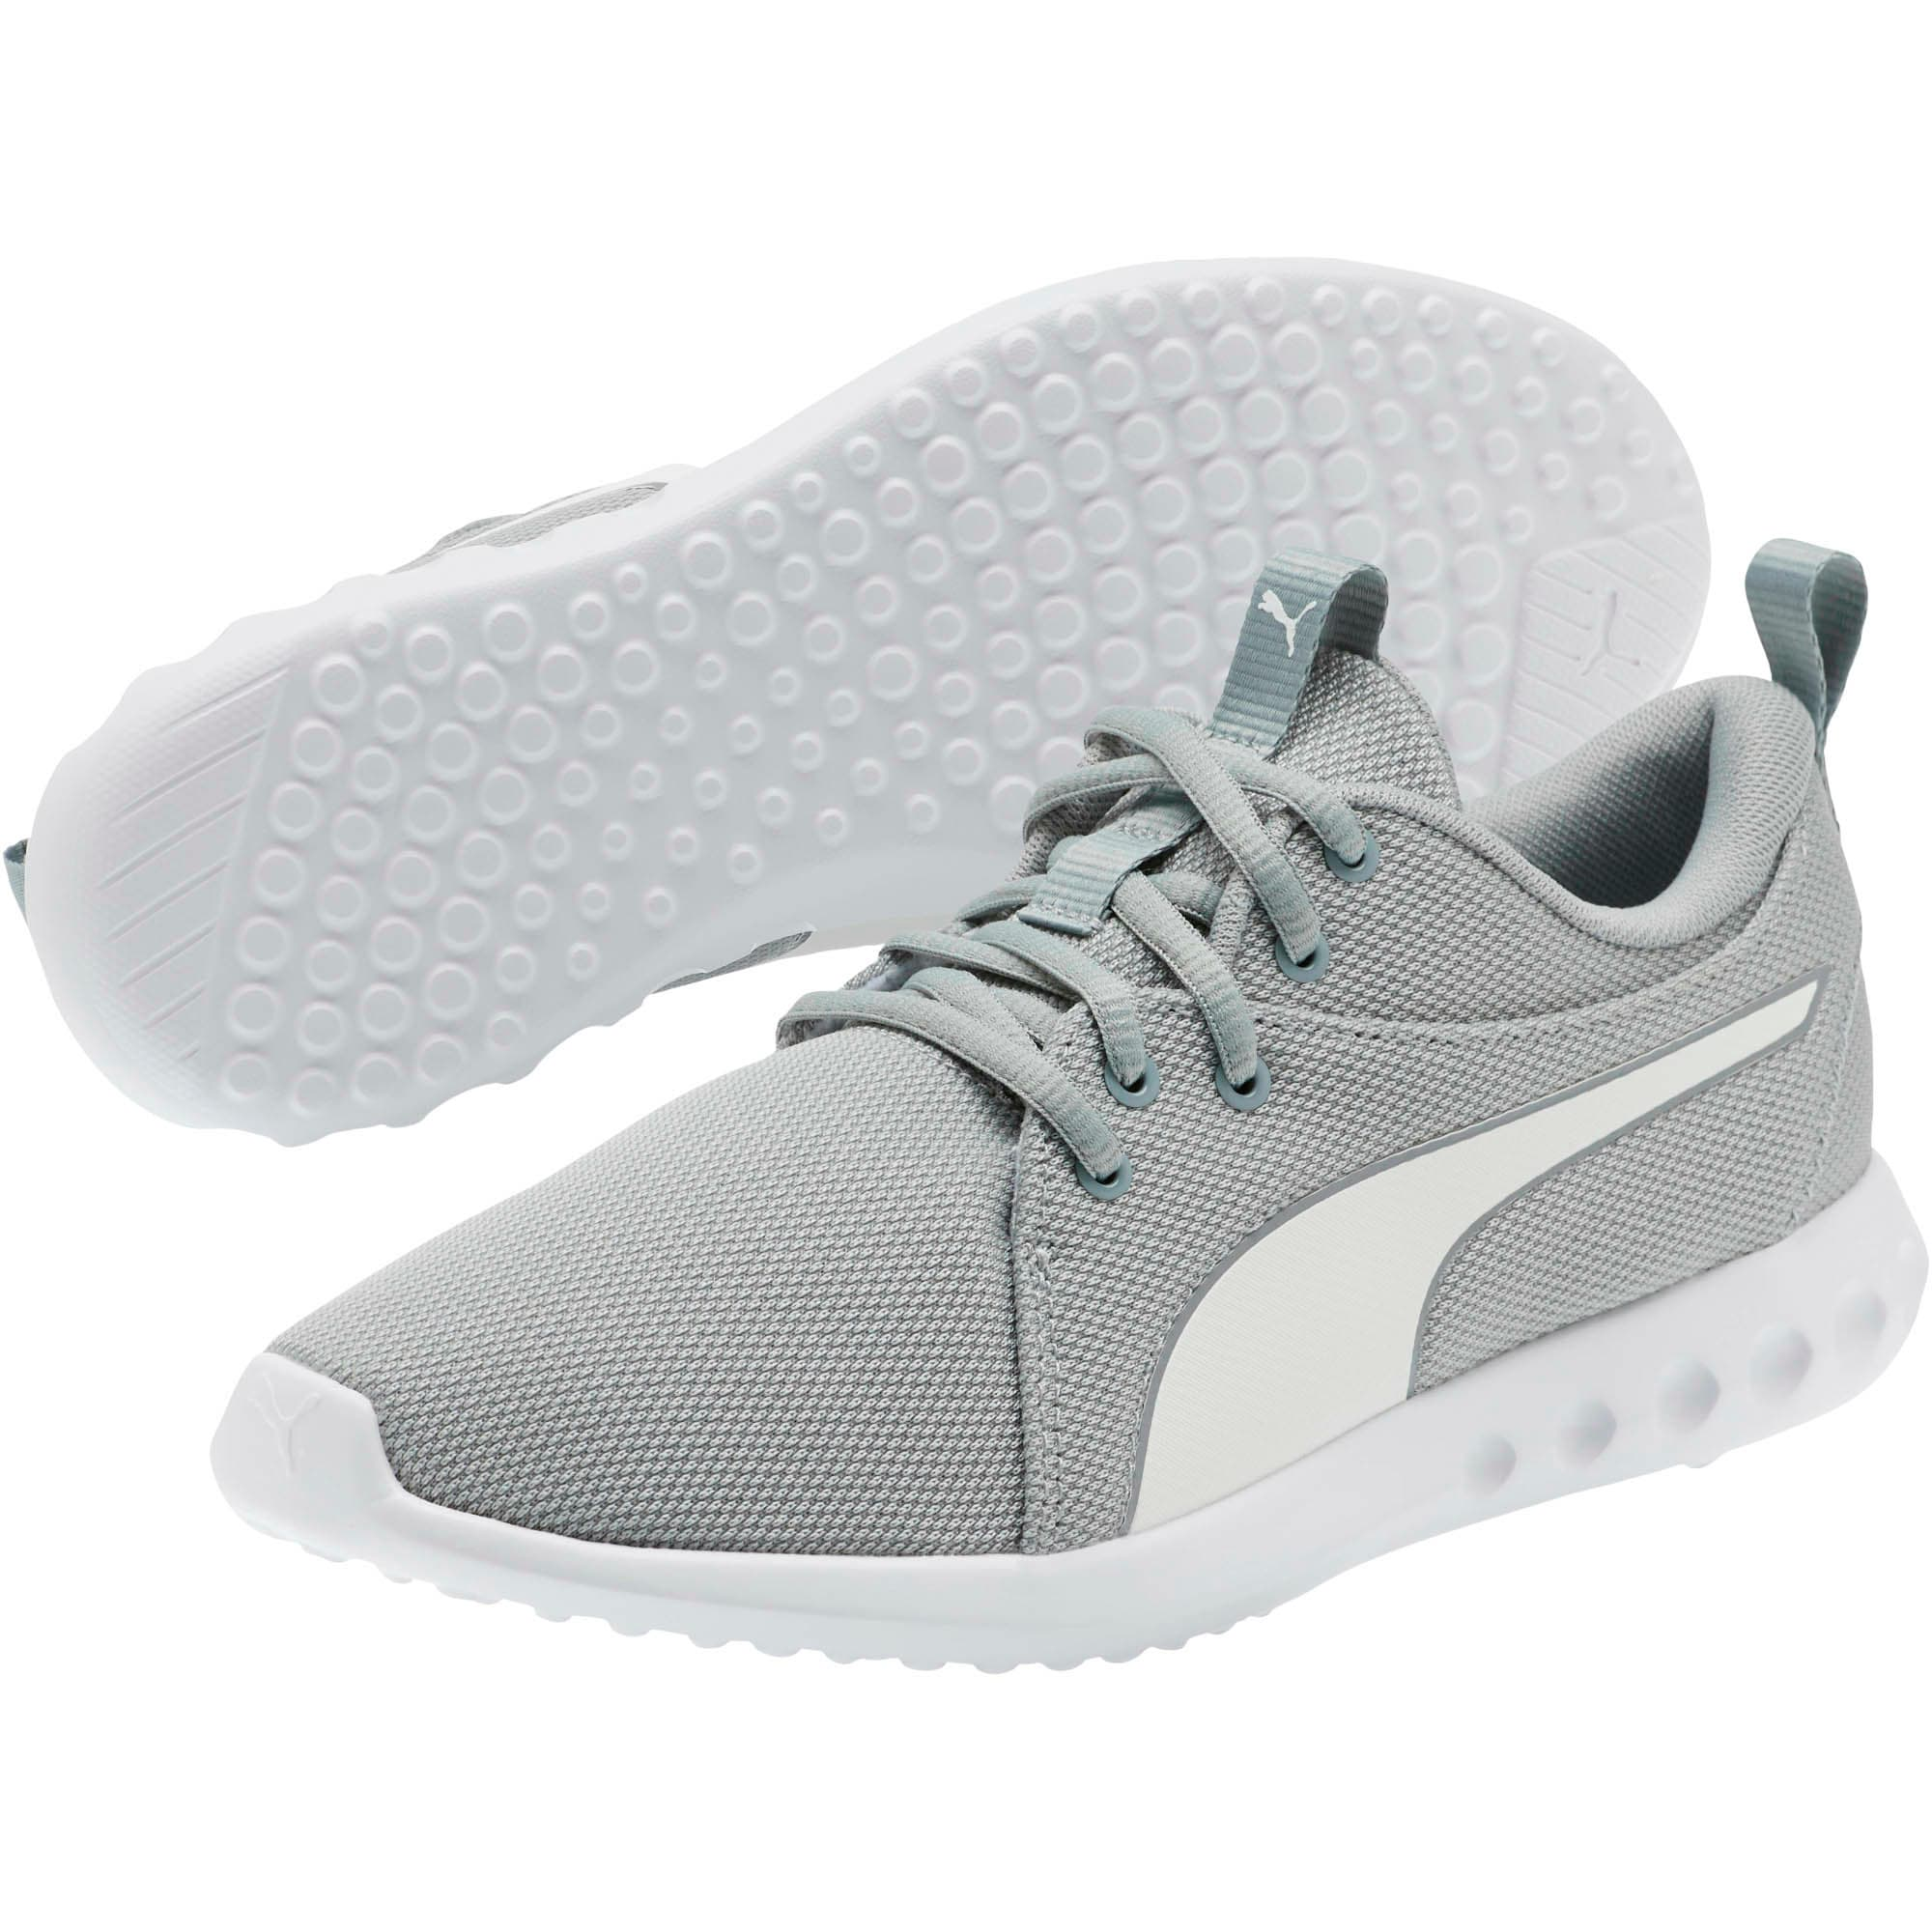 Thumbnail 2 of Carson 2 Cosmo Women's Running Shoes, Quarry-Puma White, medium